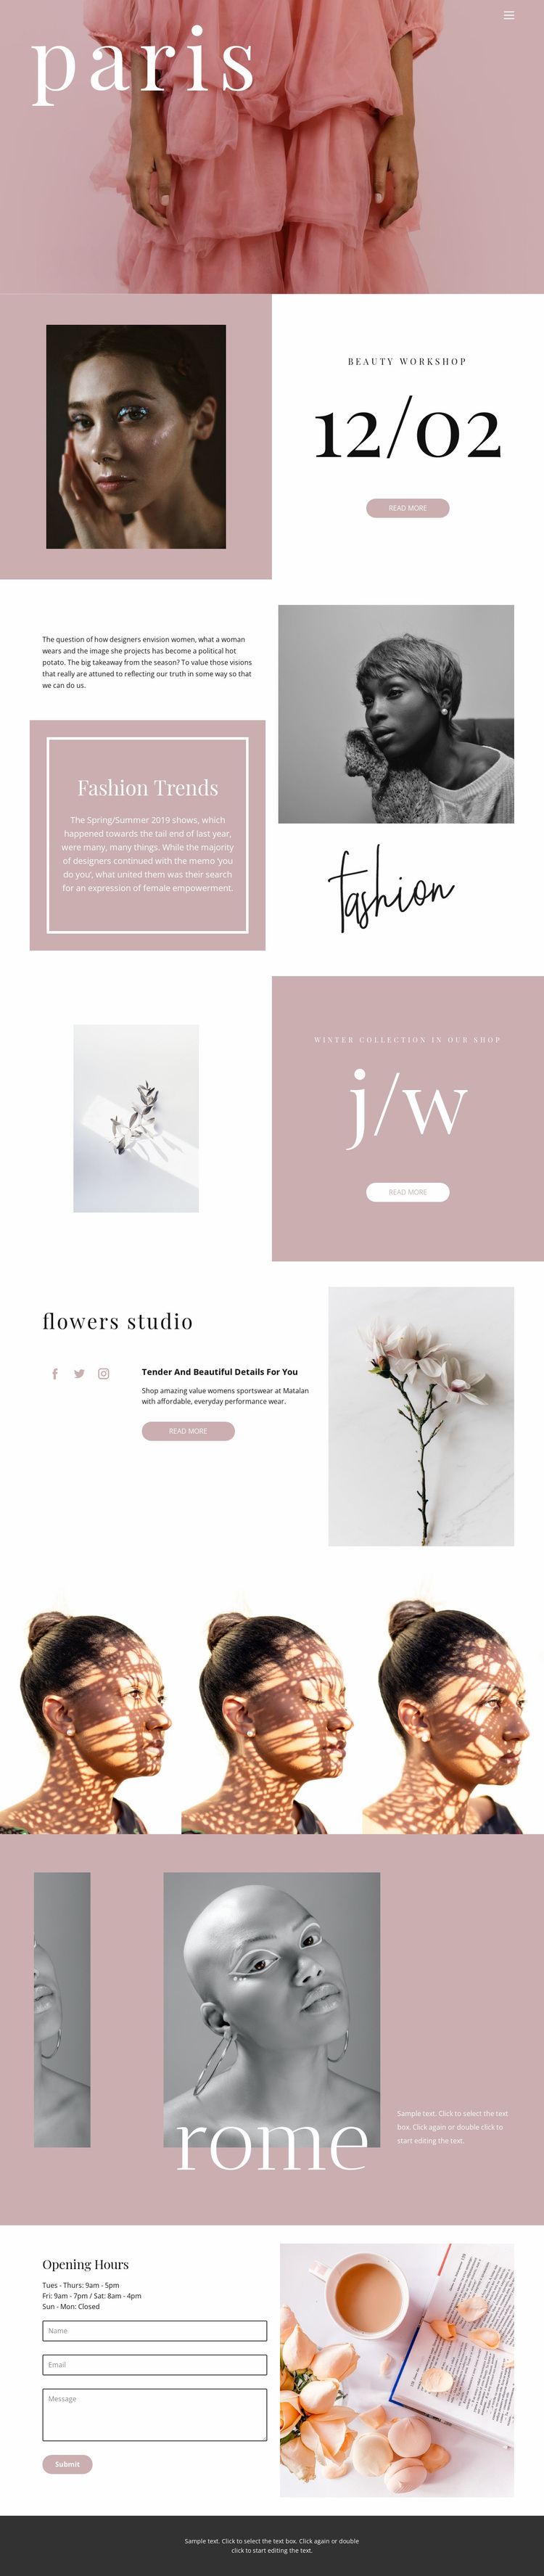 French fashion Website Design